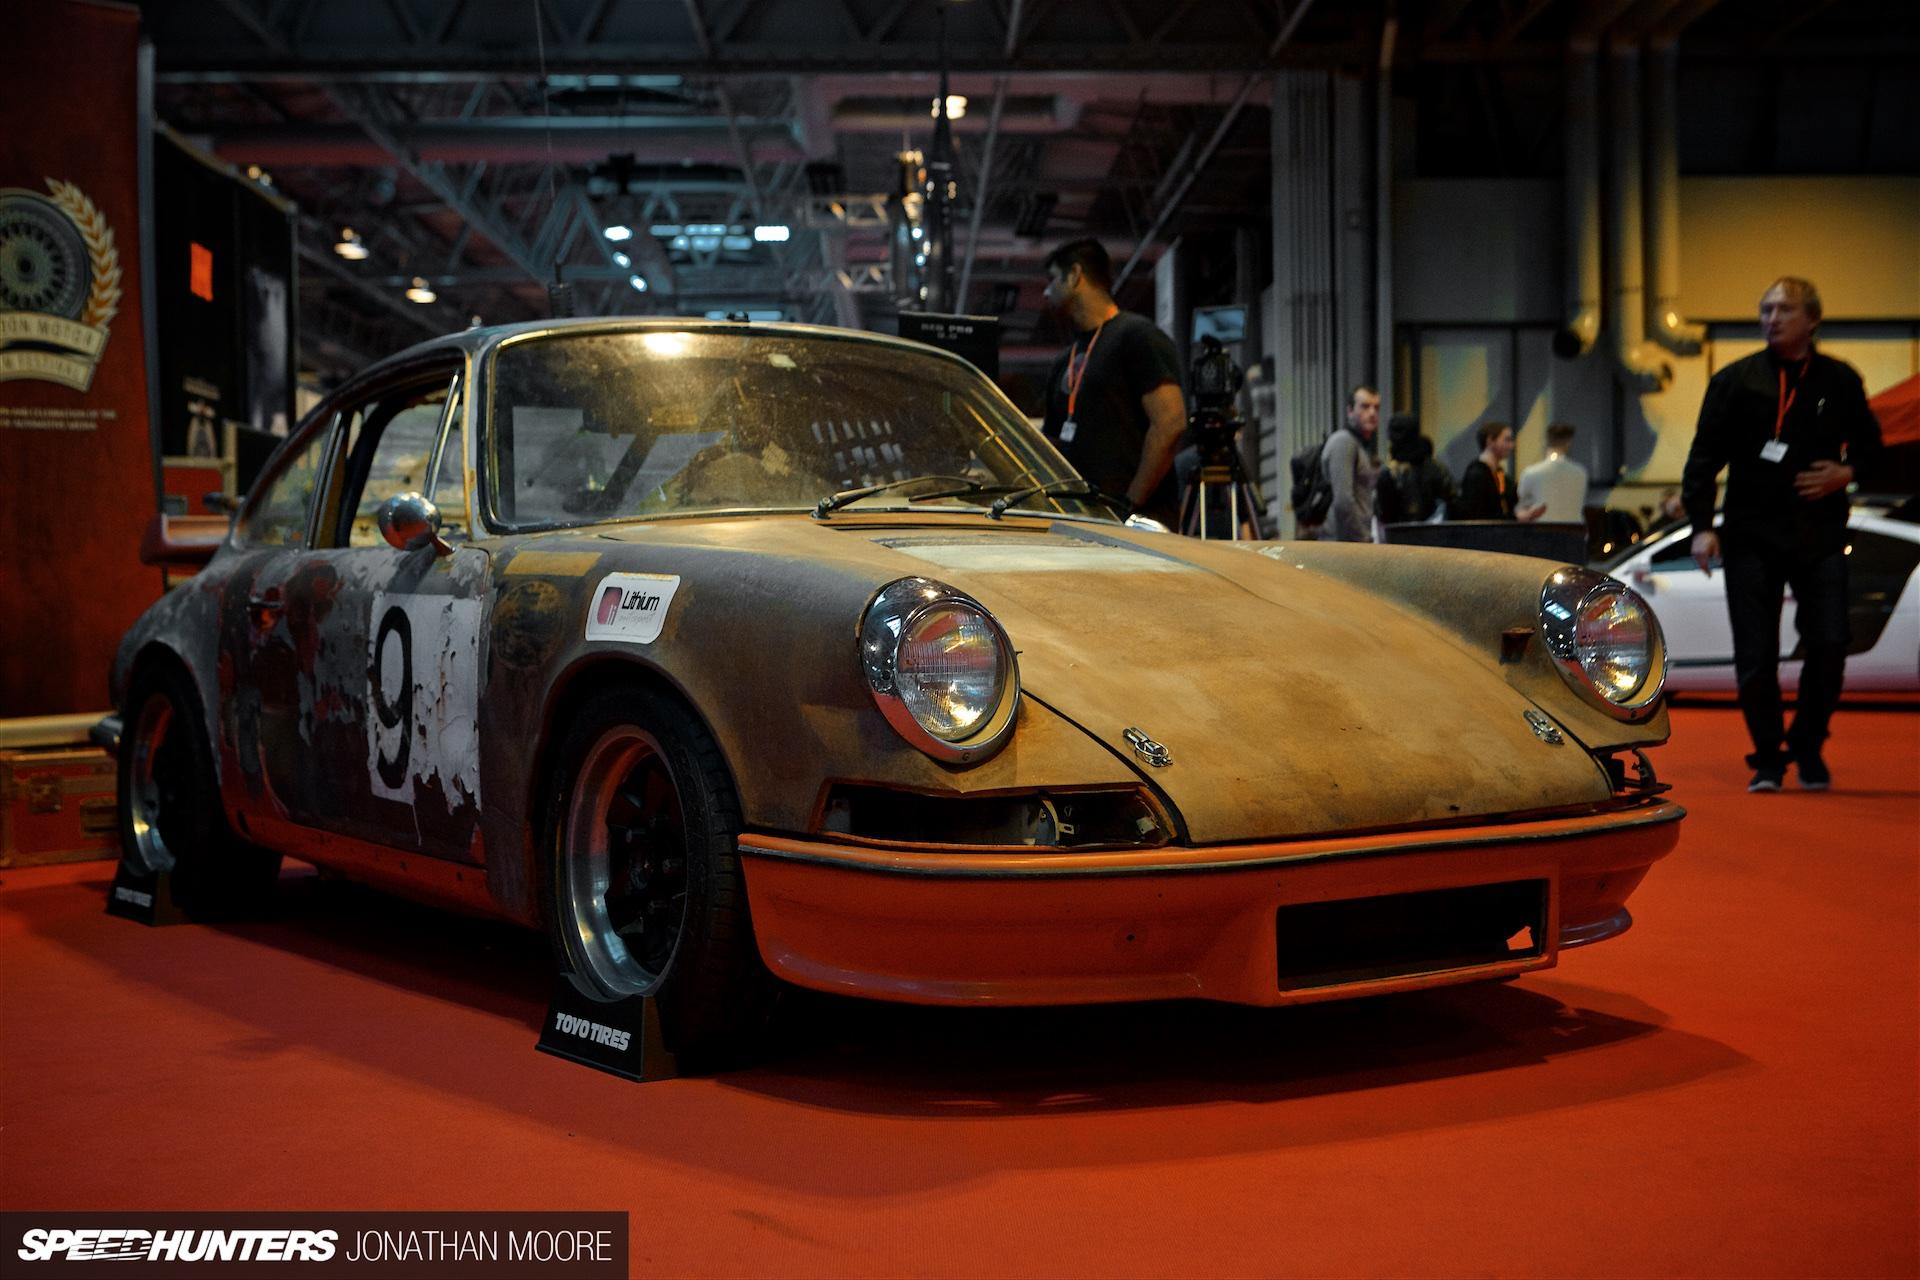 Sleeper Car Wallpaper Porsche Emergency Dial 911 F I R E Speedhunters